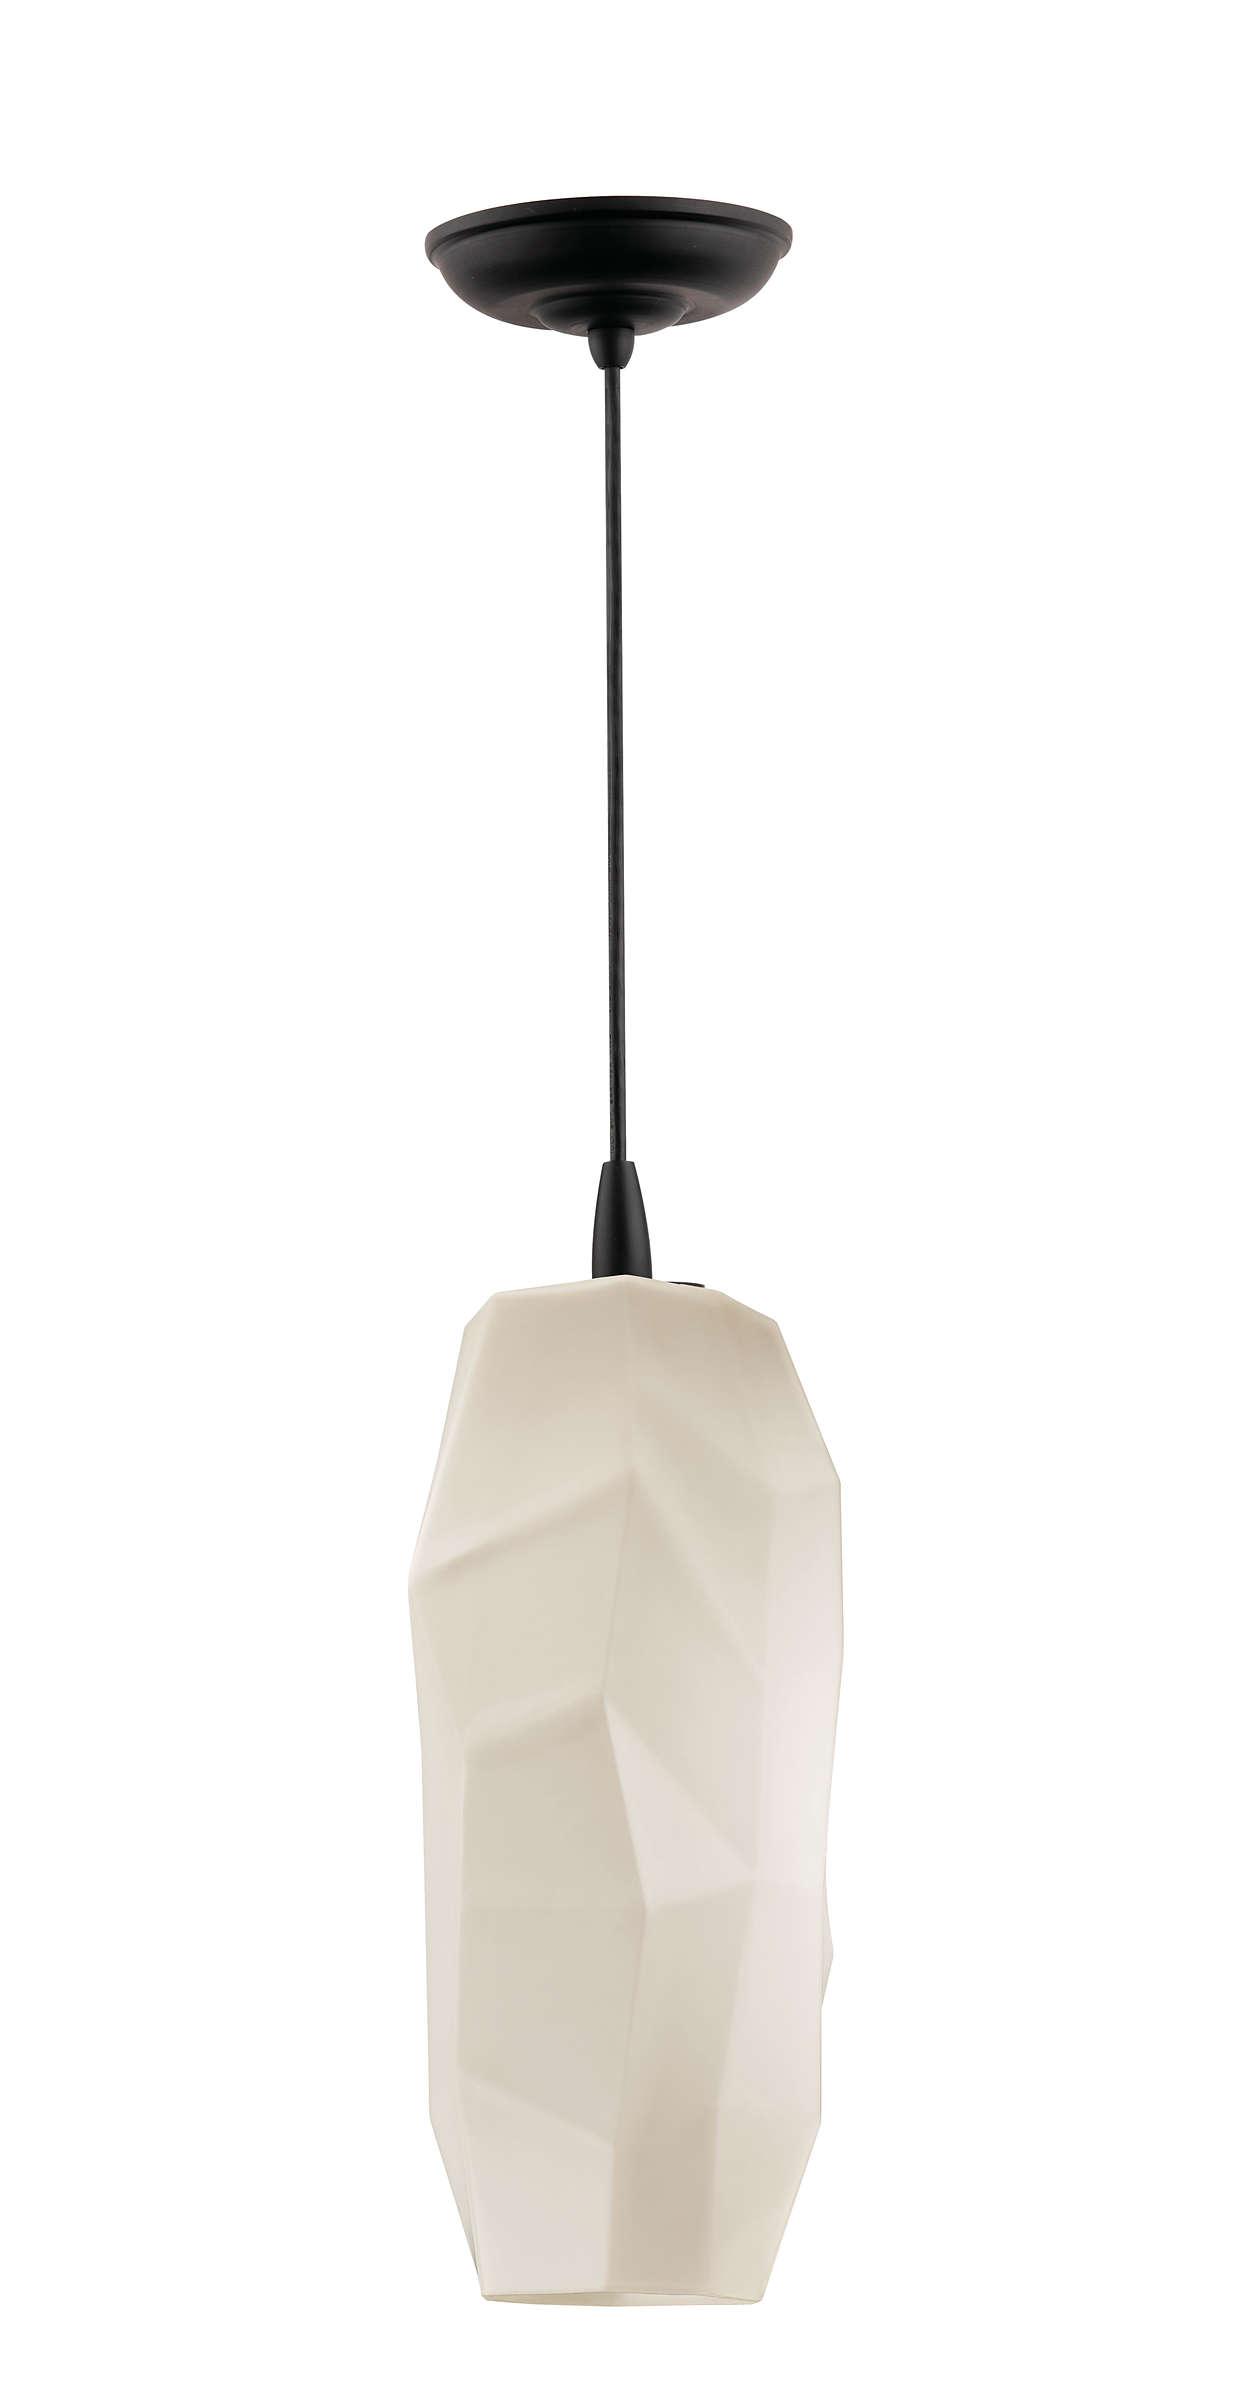 Facet 1-light pendant in Black finish